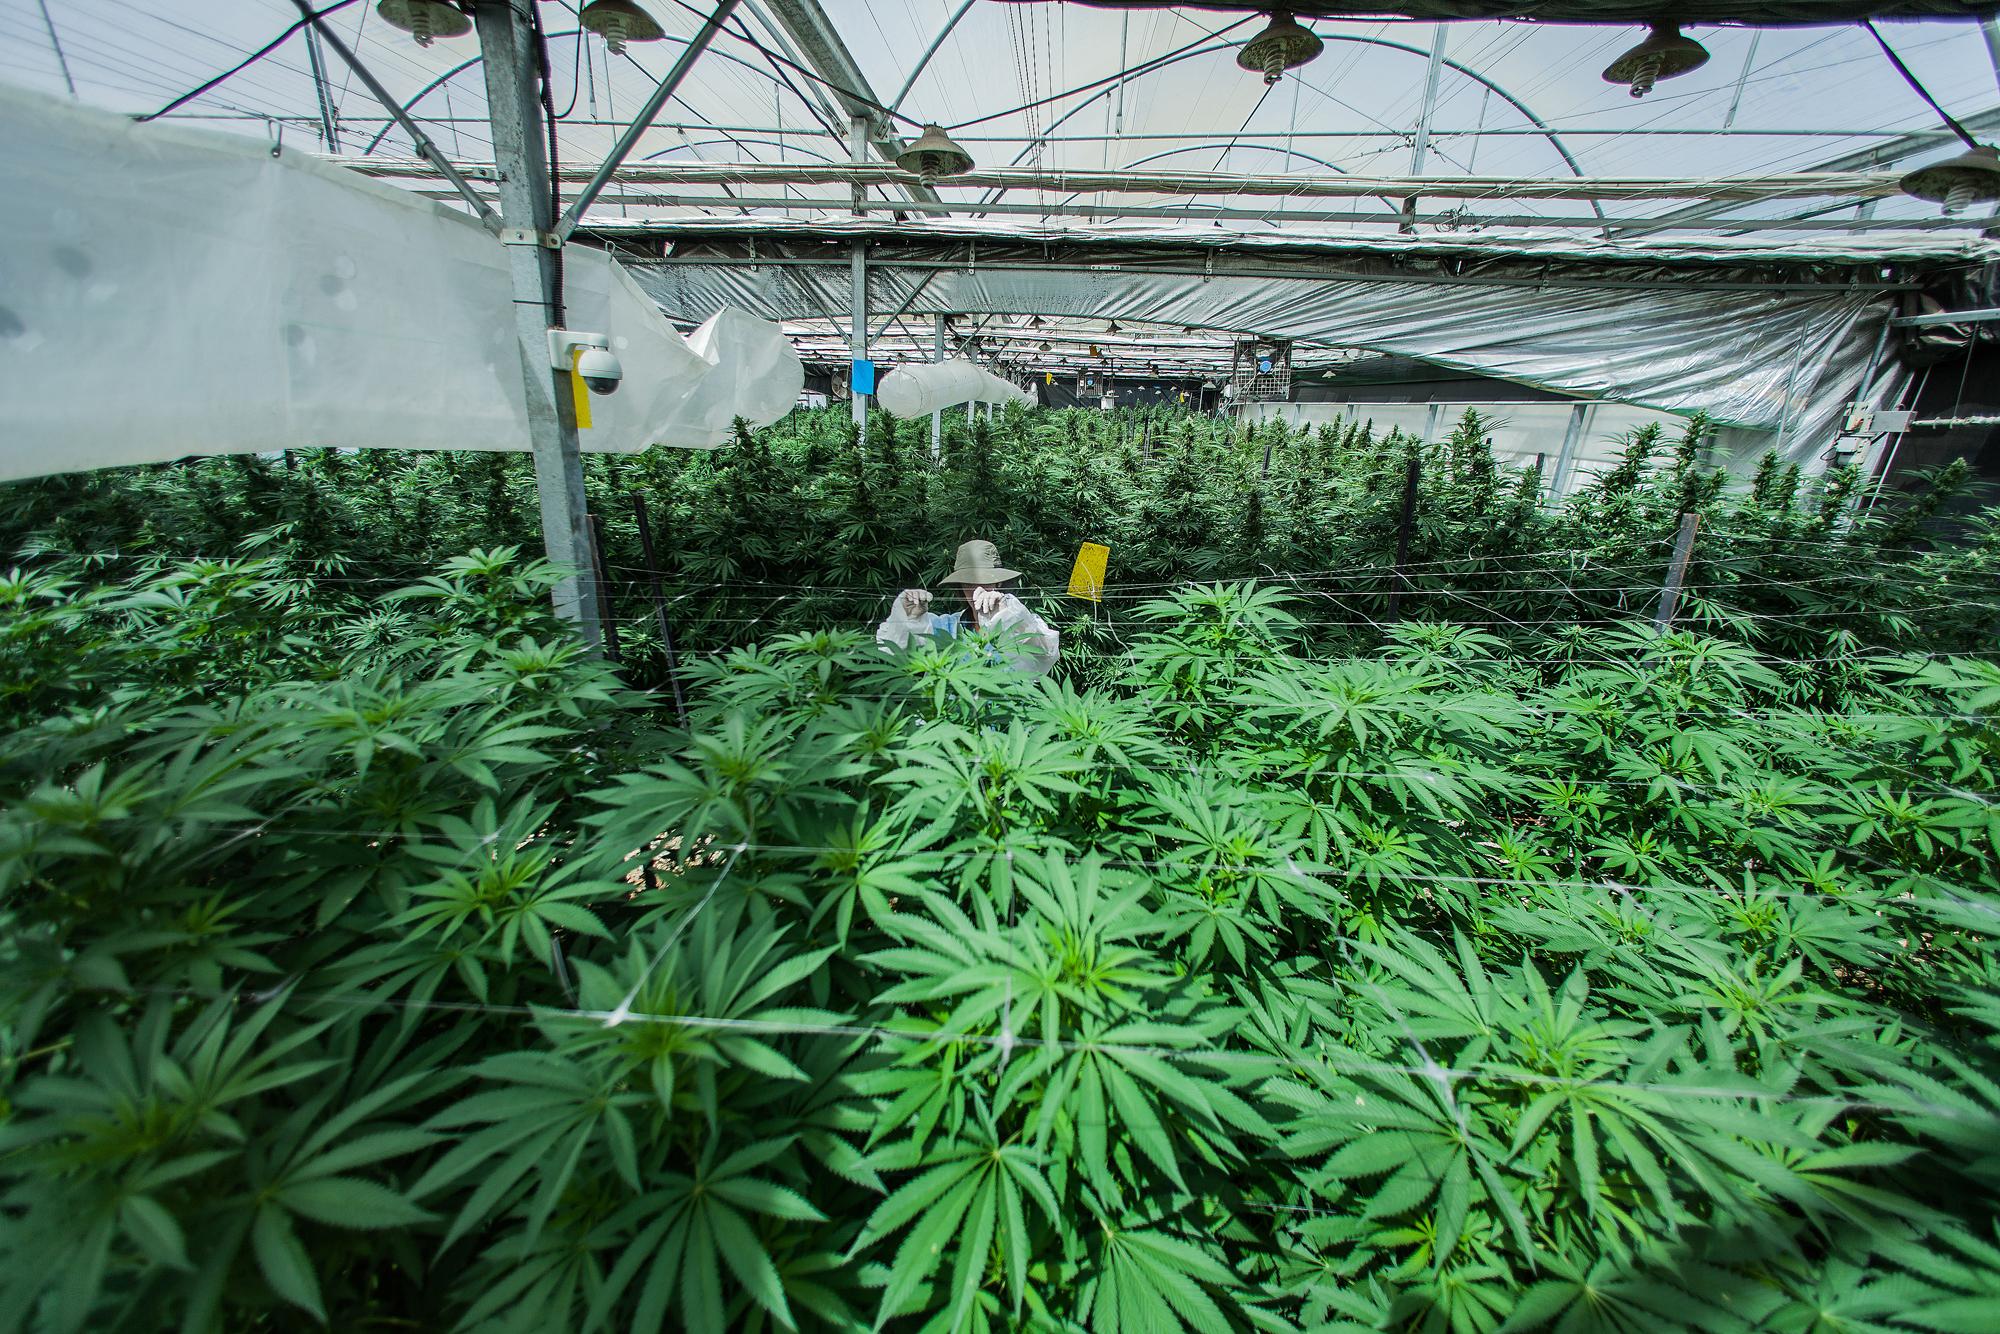 CannabisCancer1 A hard look at whether cannabis really cures cancer